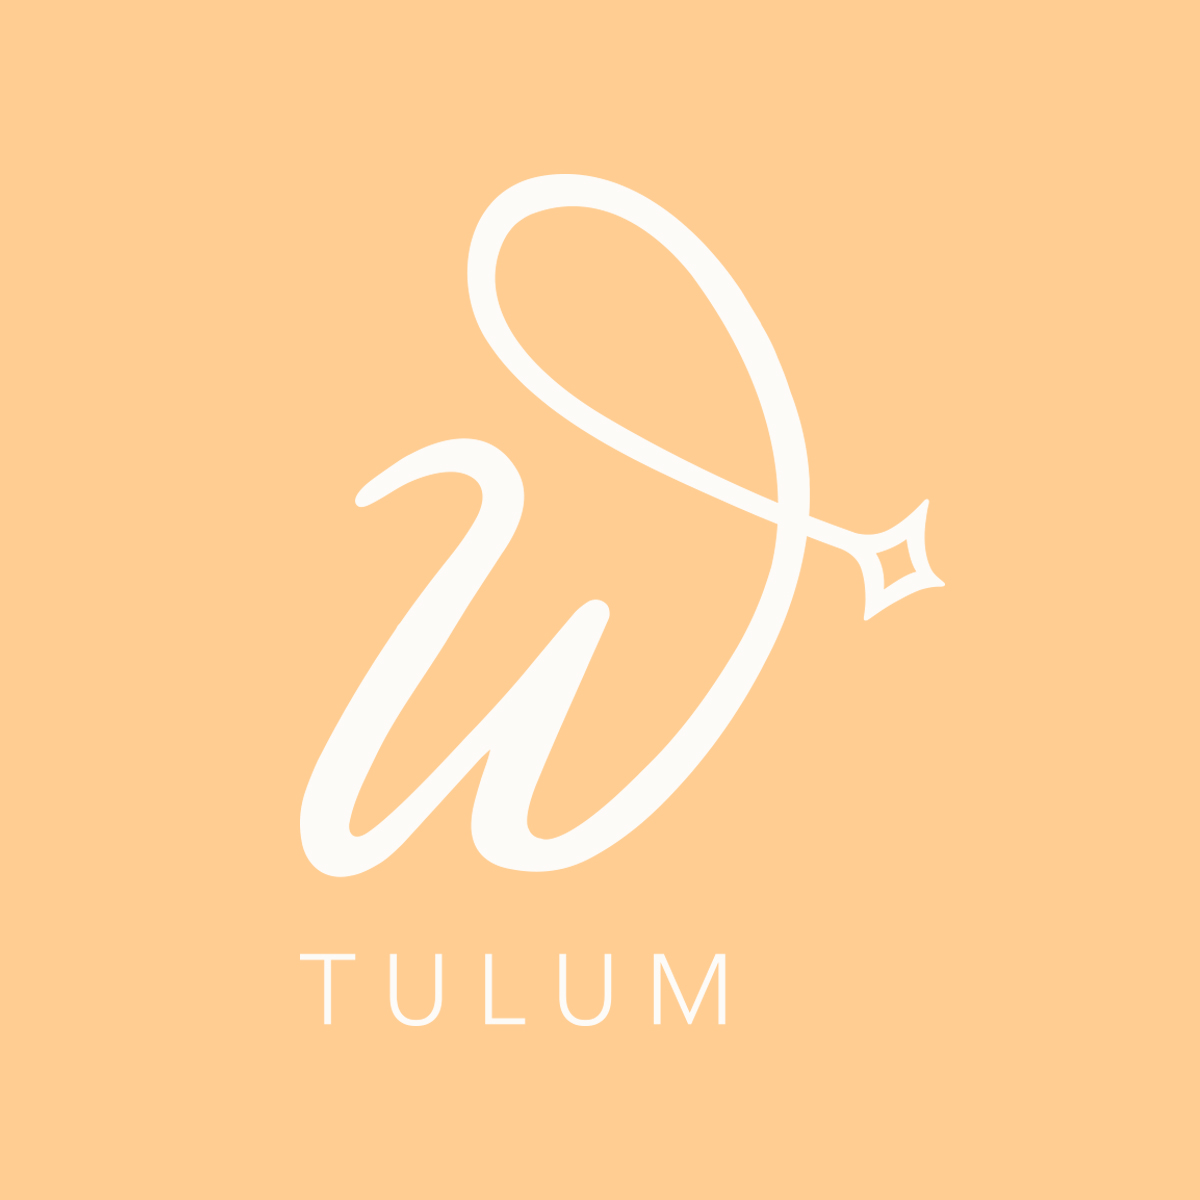 Simply tulum wish tulum